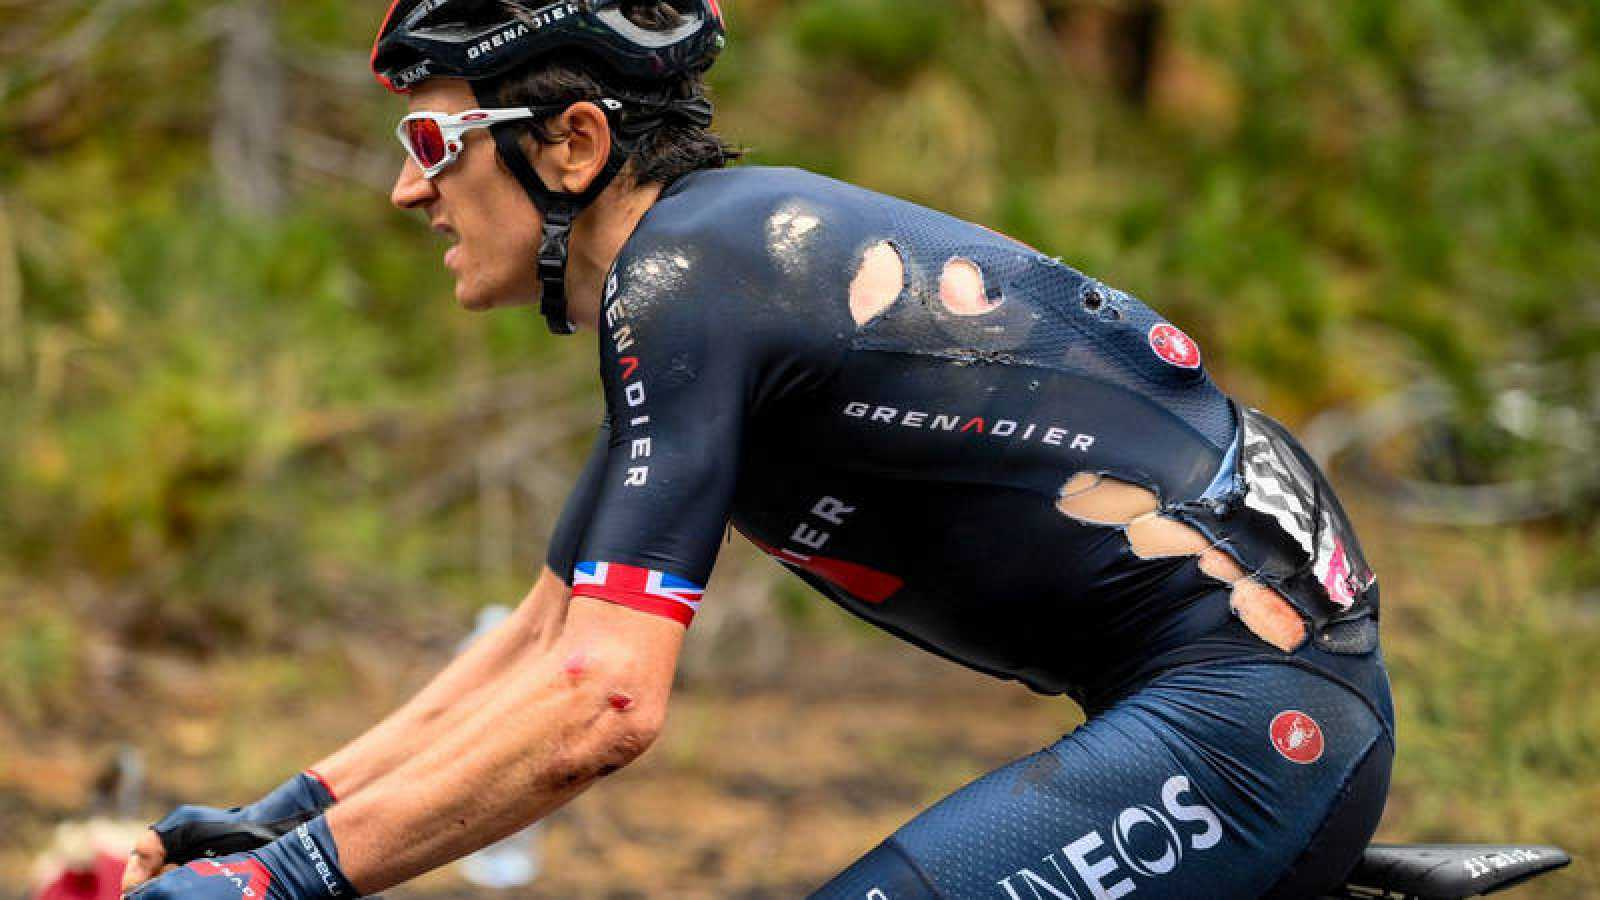 Imagen del galés Geraint Thomas (Ineos) durante la tercera etapa del Giro de Italia 2020.